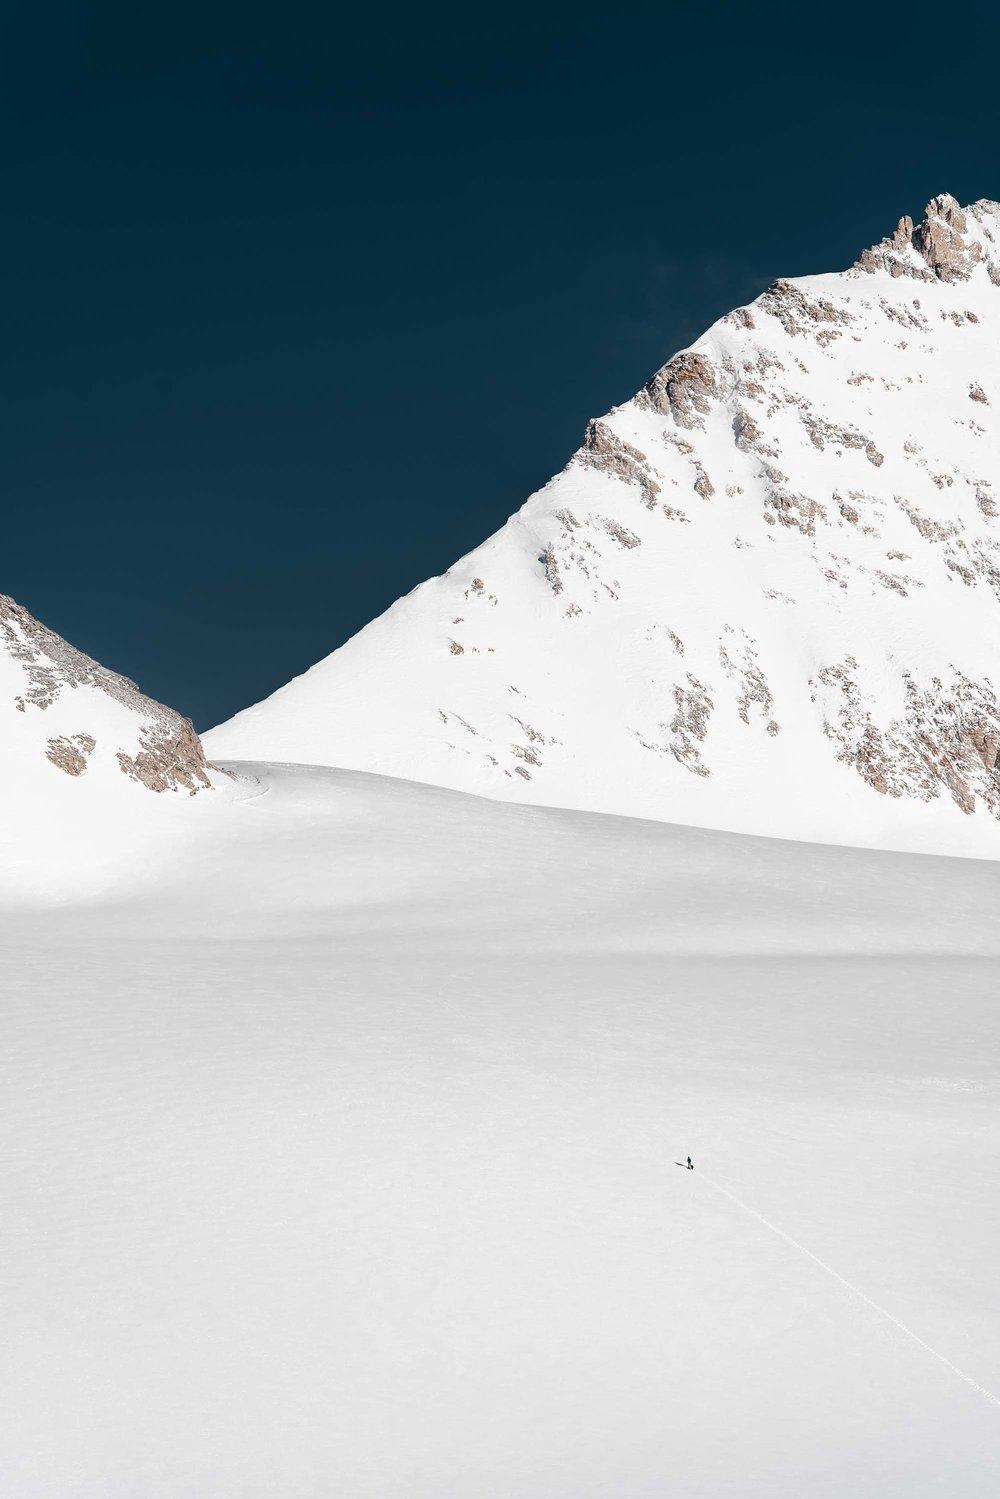 Maximilian_Otto_Best-of-the-Alps_310119_02.jpg